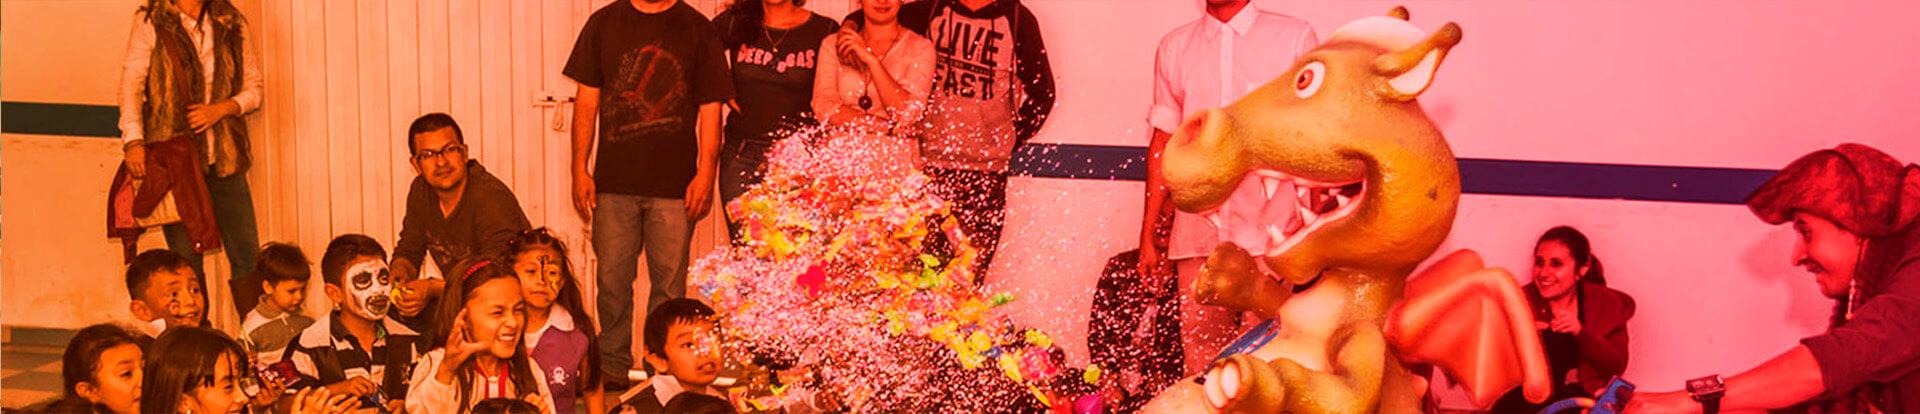 mundo aventura fiestas infantiles bannerFI-003